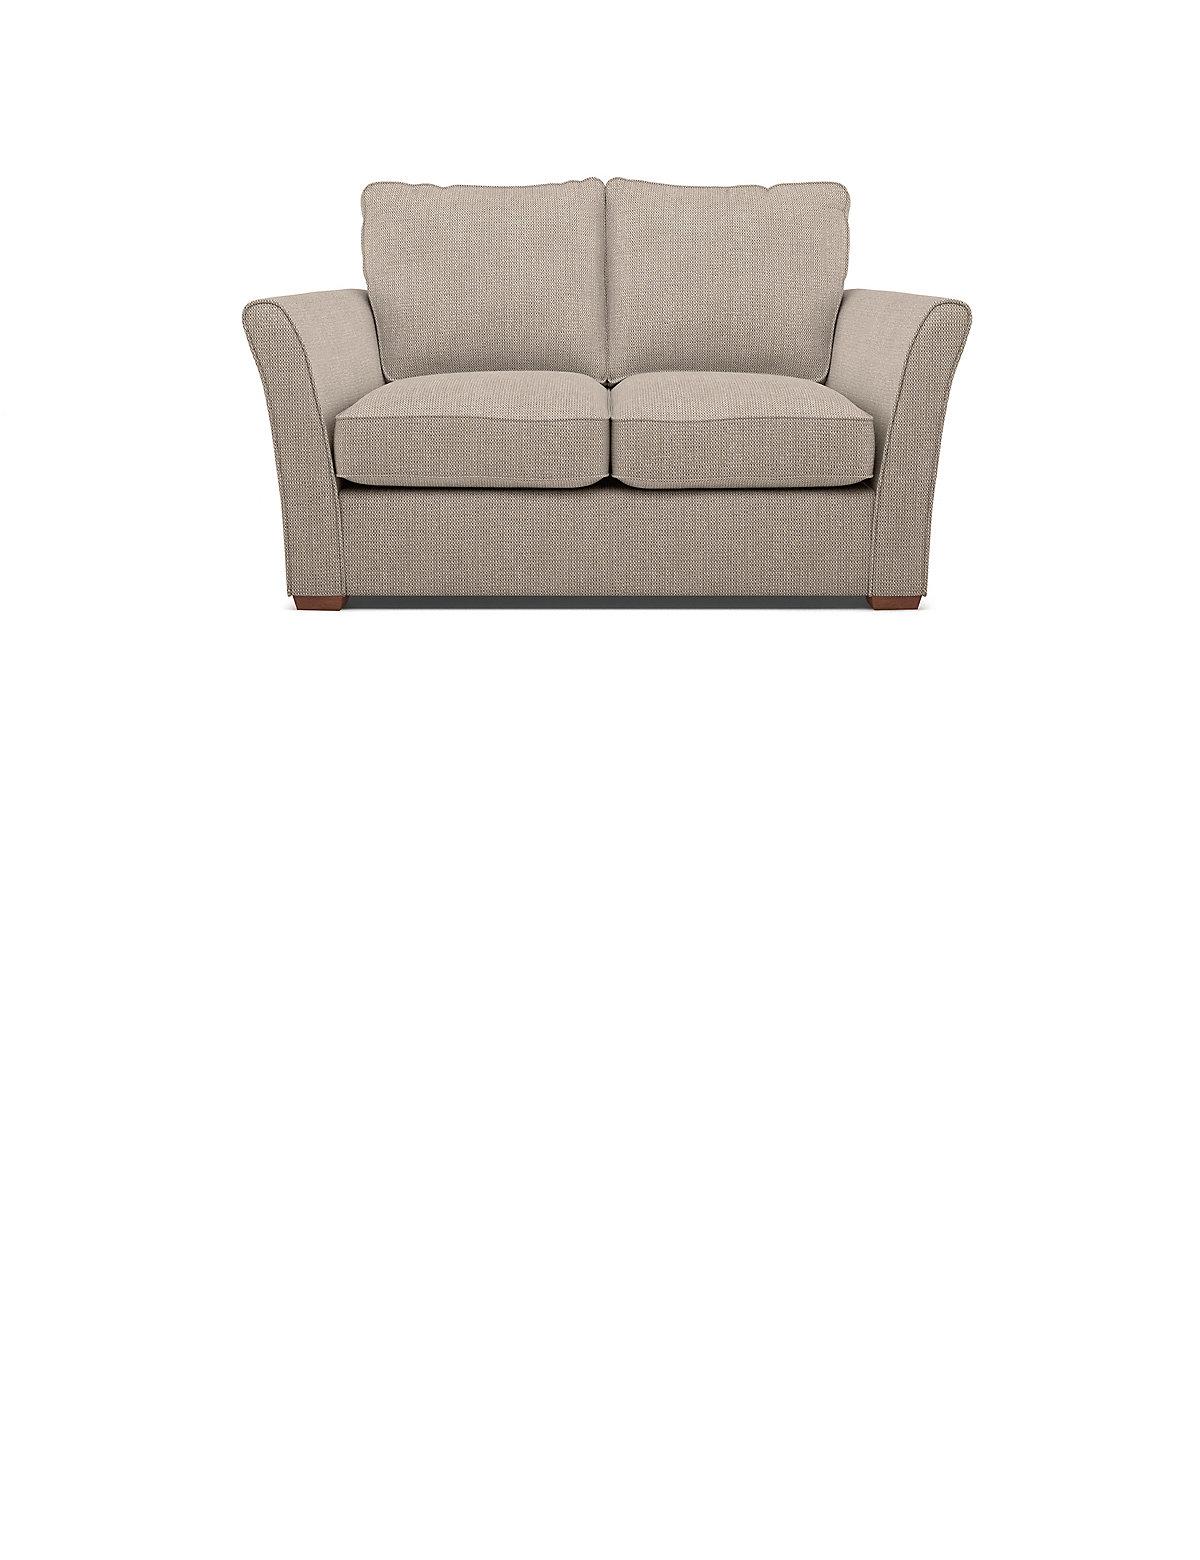 Hamilton Compact Sofa